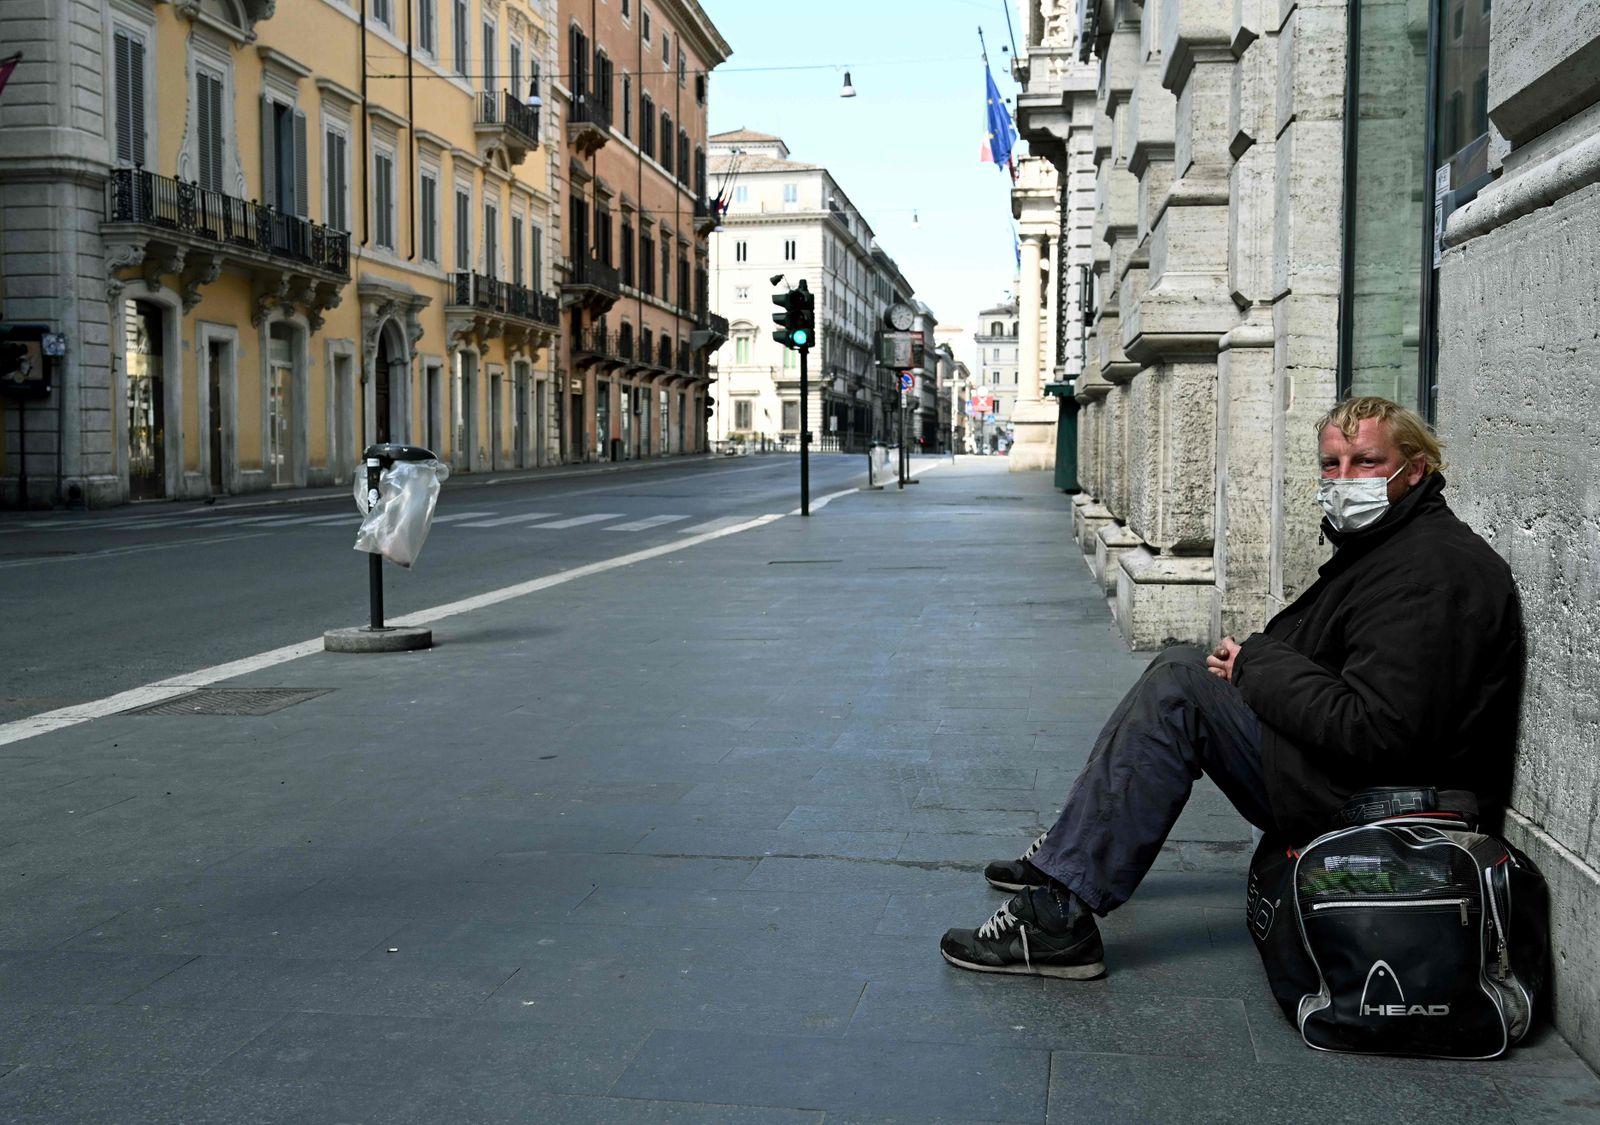 TOPSHOT-ITALY-HEALTH-VIRUS-HOMELESS